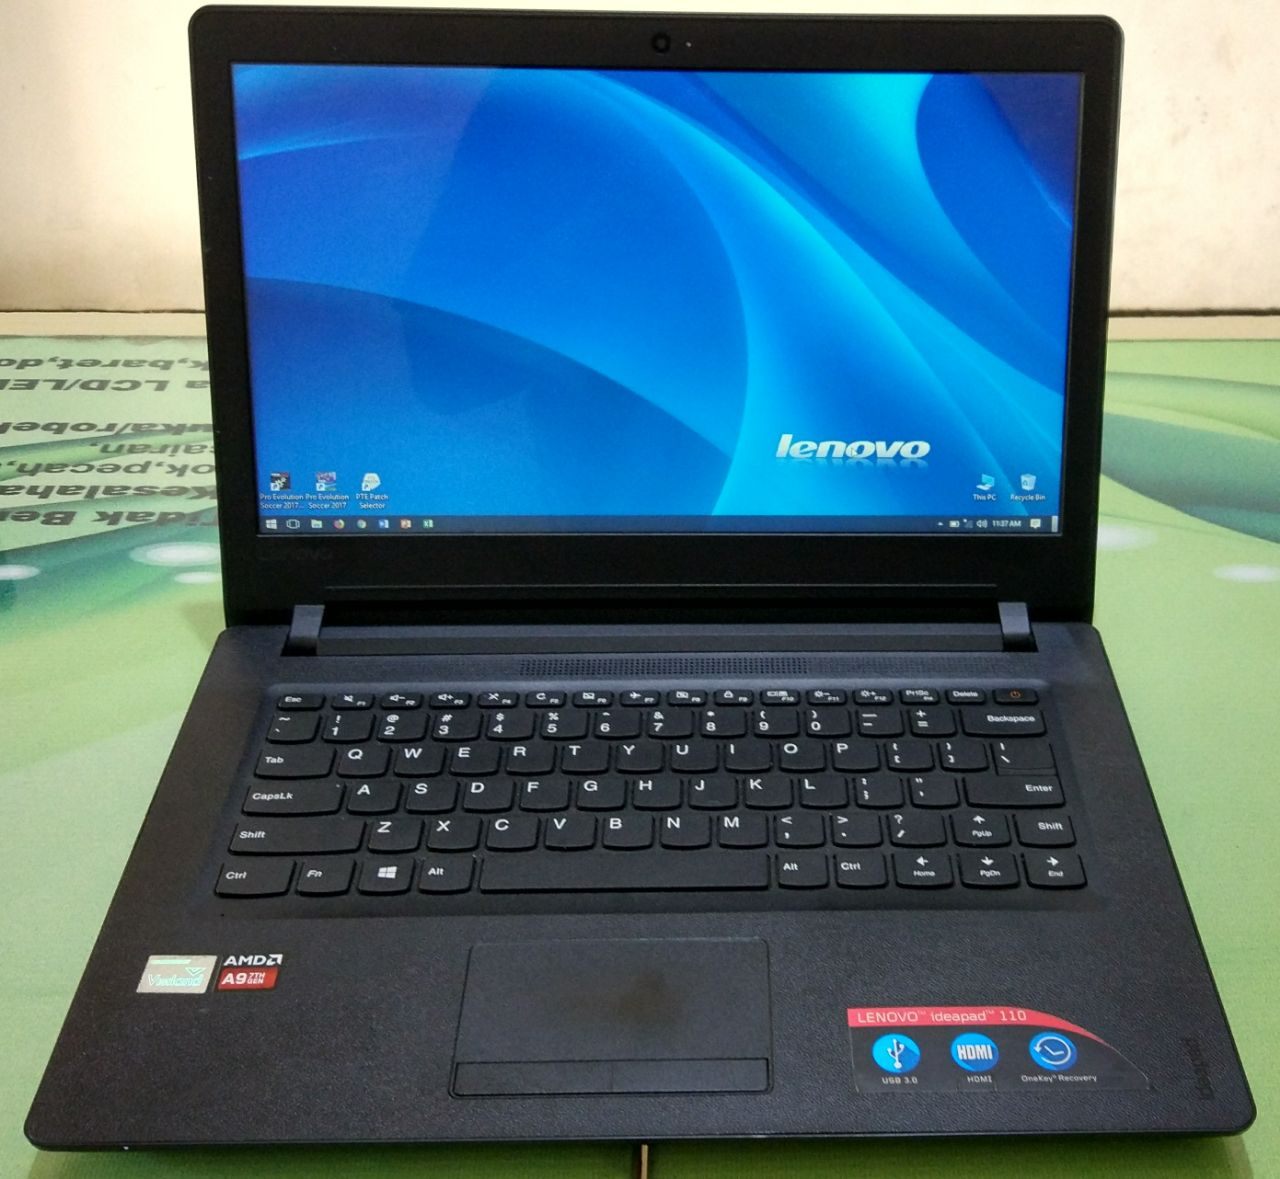 Lenovo 110 Amd A9 9400 4gb Ram Ddr4 1tb Hdd Daftar Harga Terkini Ideapad 05id 14ast Processor Quadcore Memory Dvdrw Harddisk Legaaa